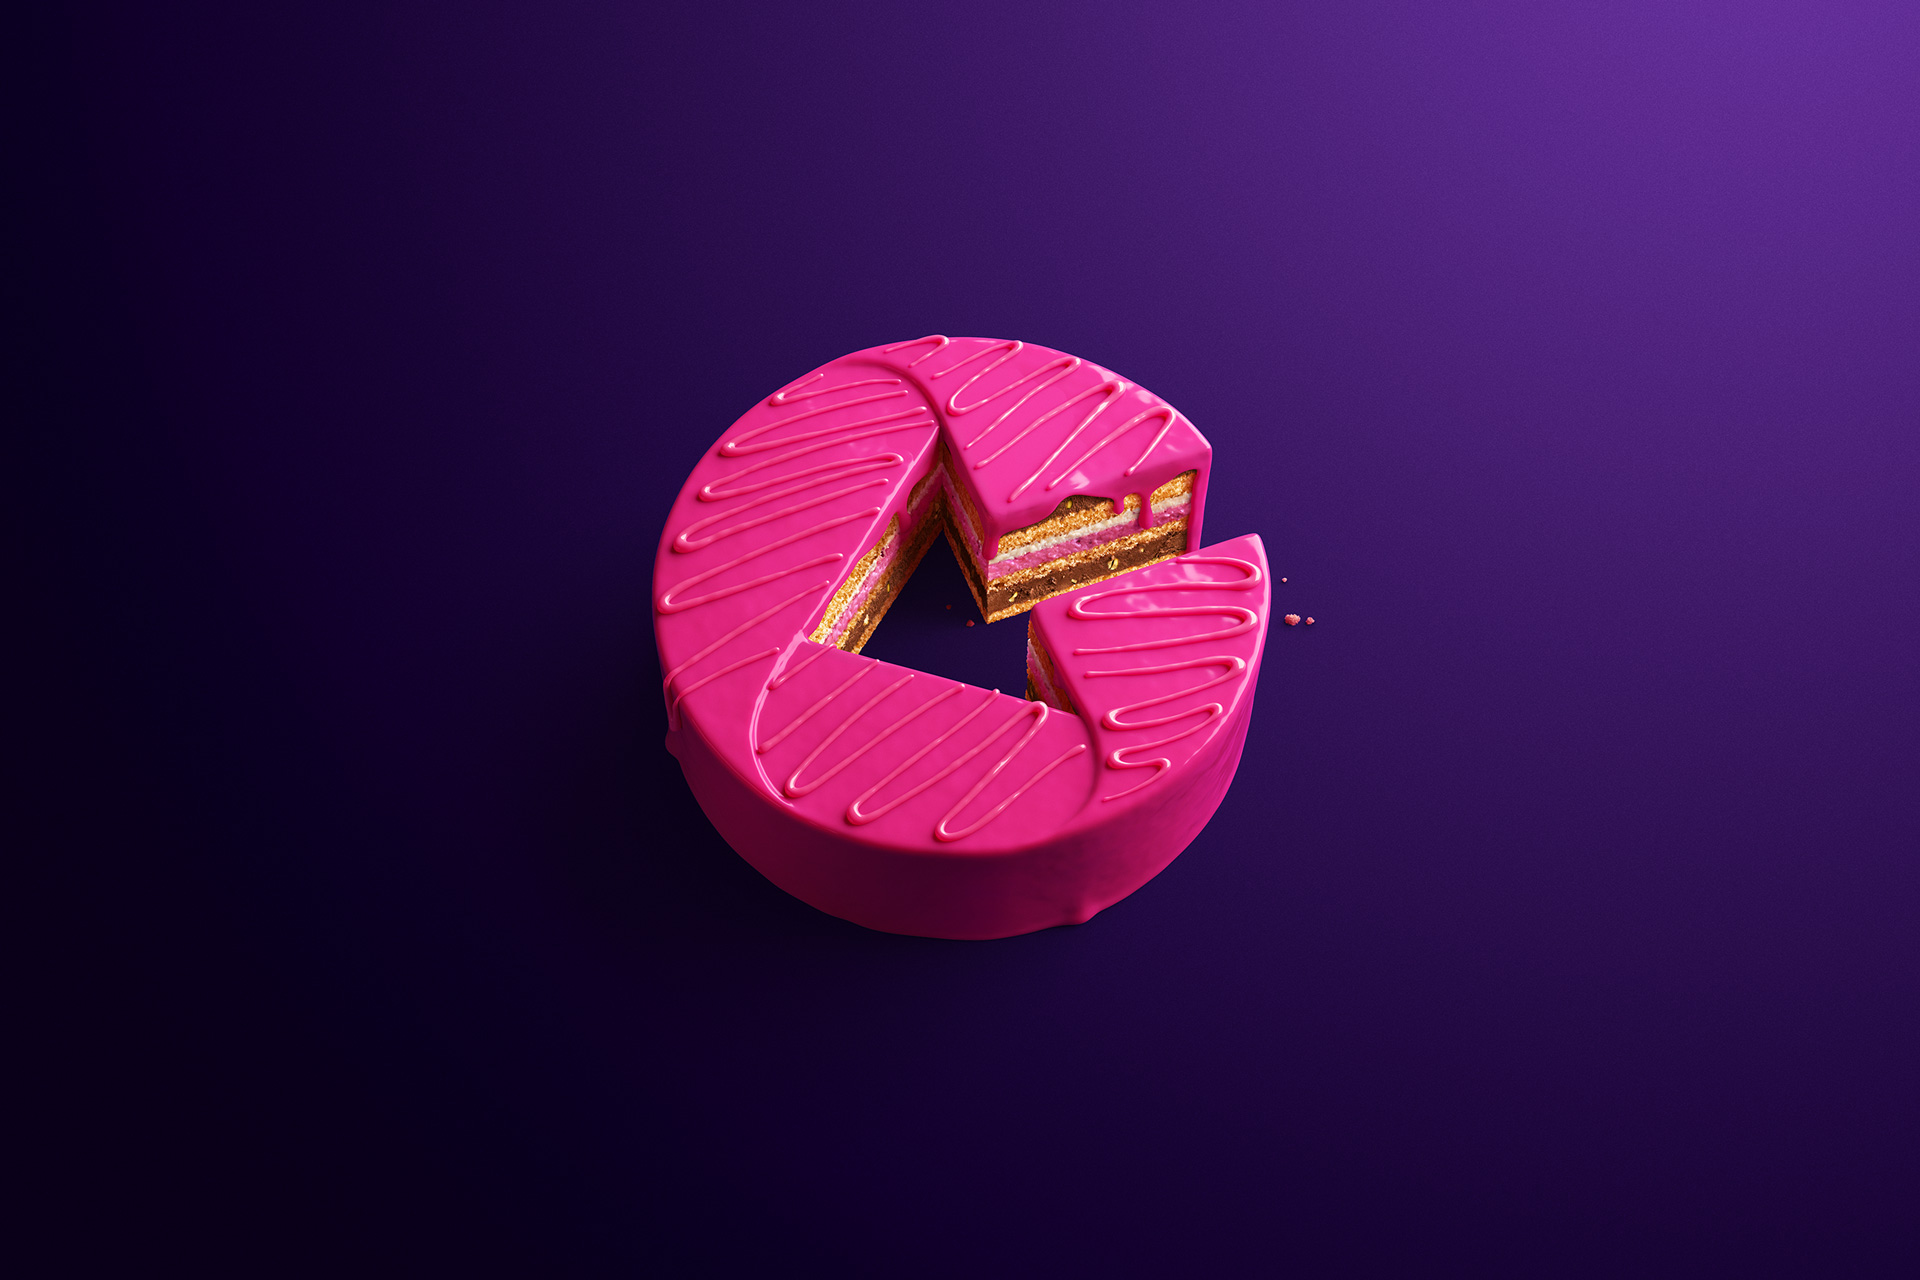 Cake-w1920-q80-01